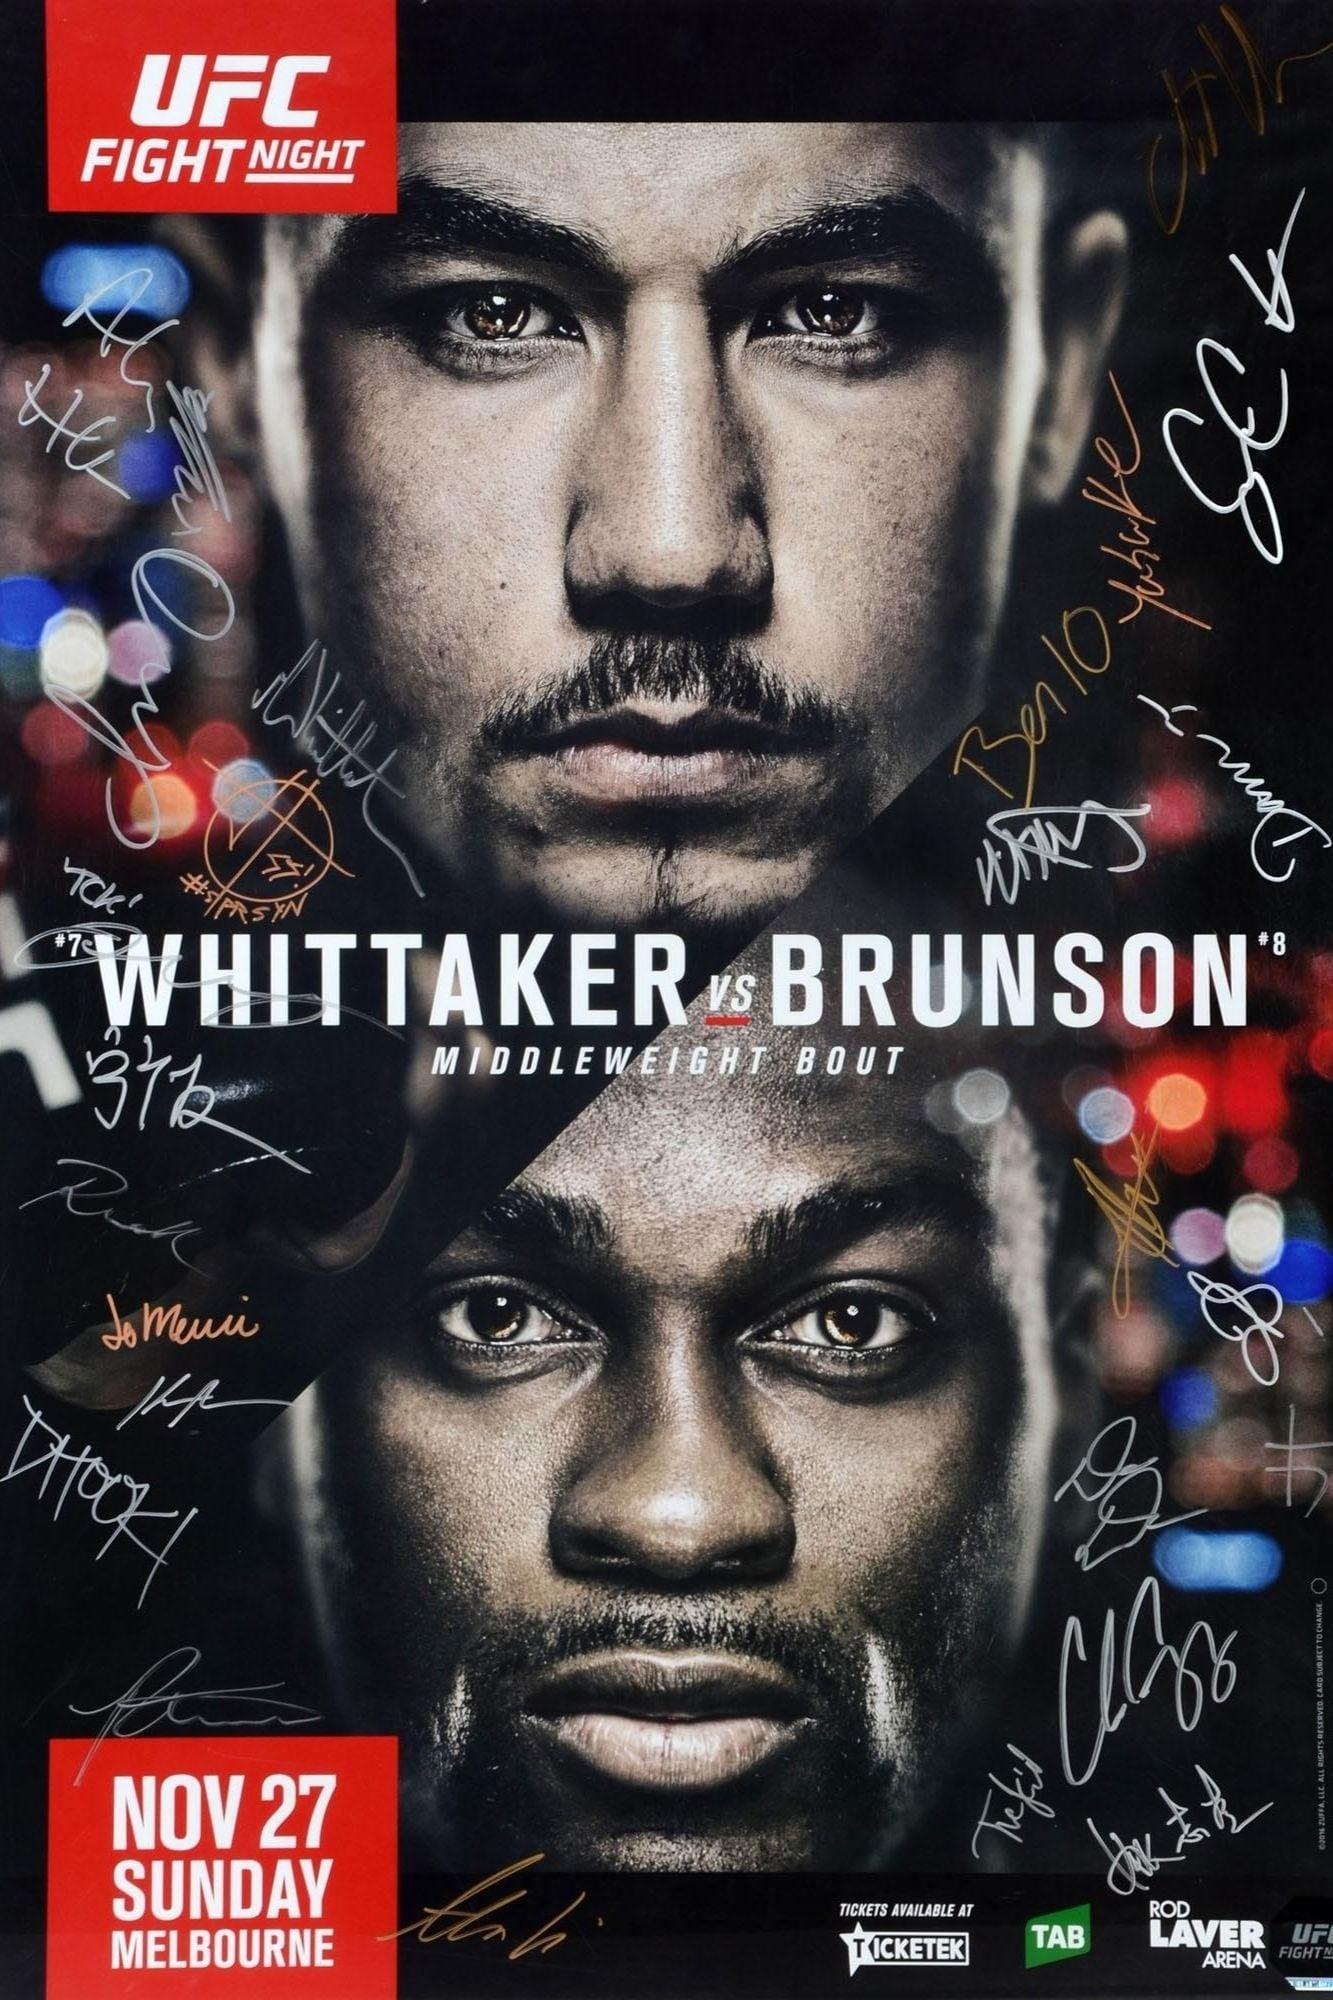 UFC Fight Night 101: Whittaker vs. Brunson